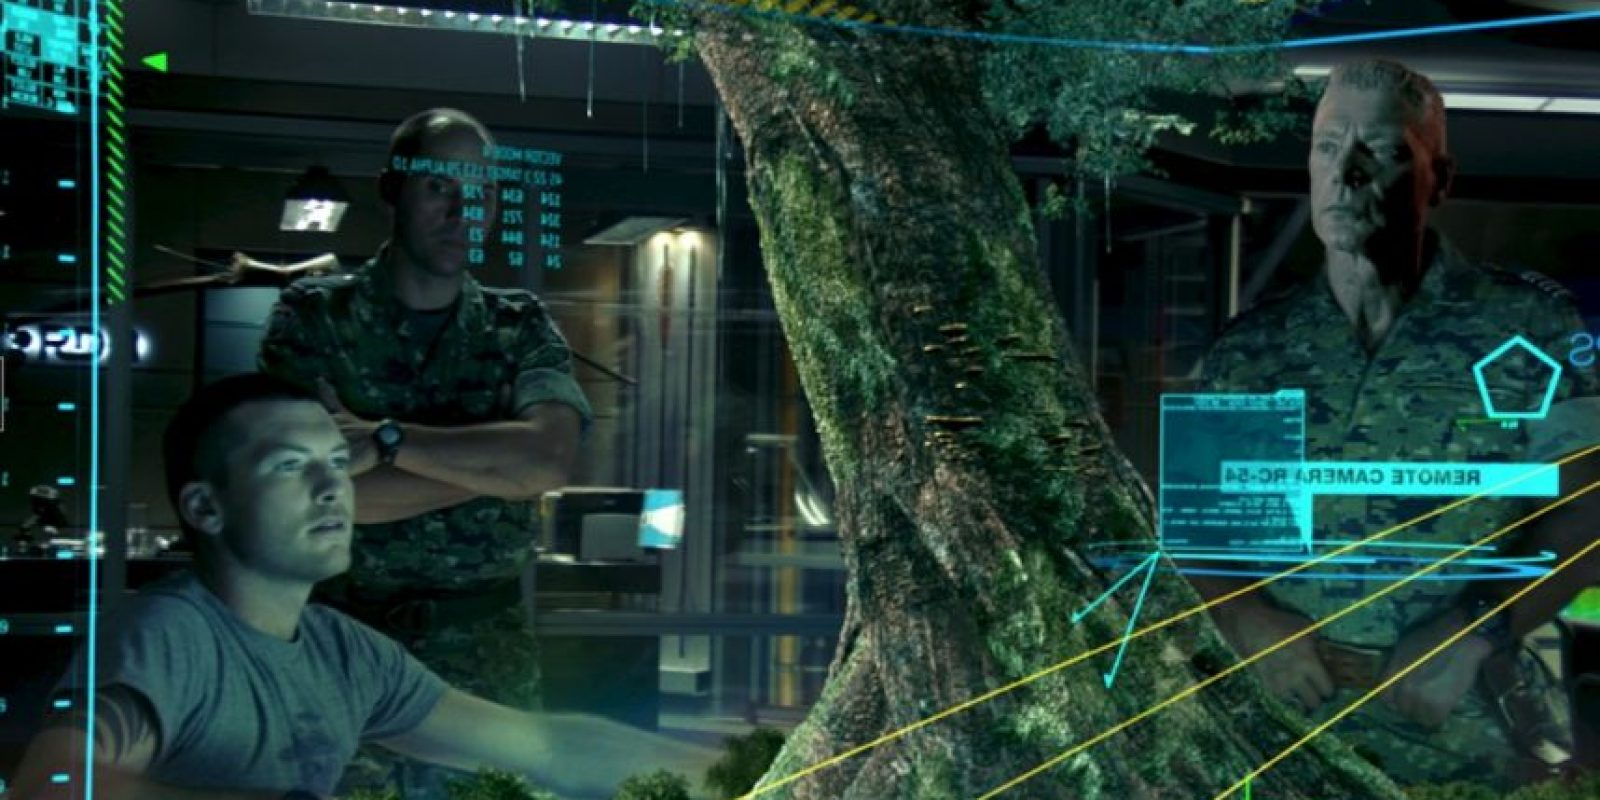 Una luna del planeta Polifemo habitada por una raza humanoide llamada na'vi. Foto:Avatarmovie.com